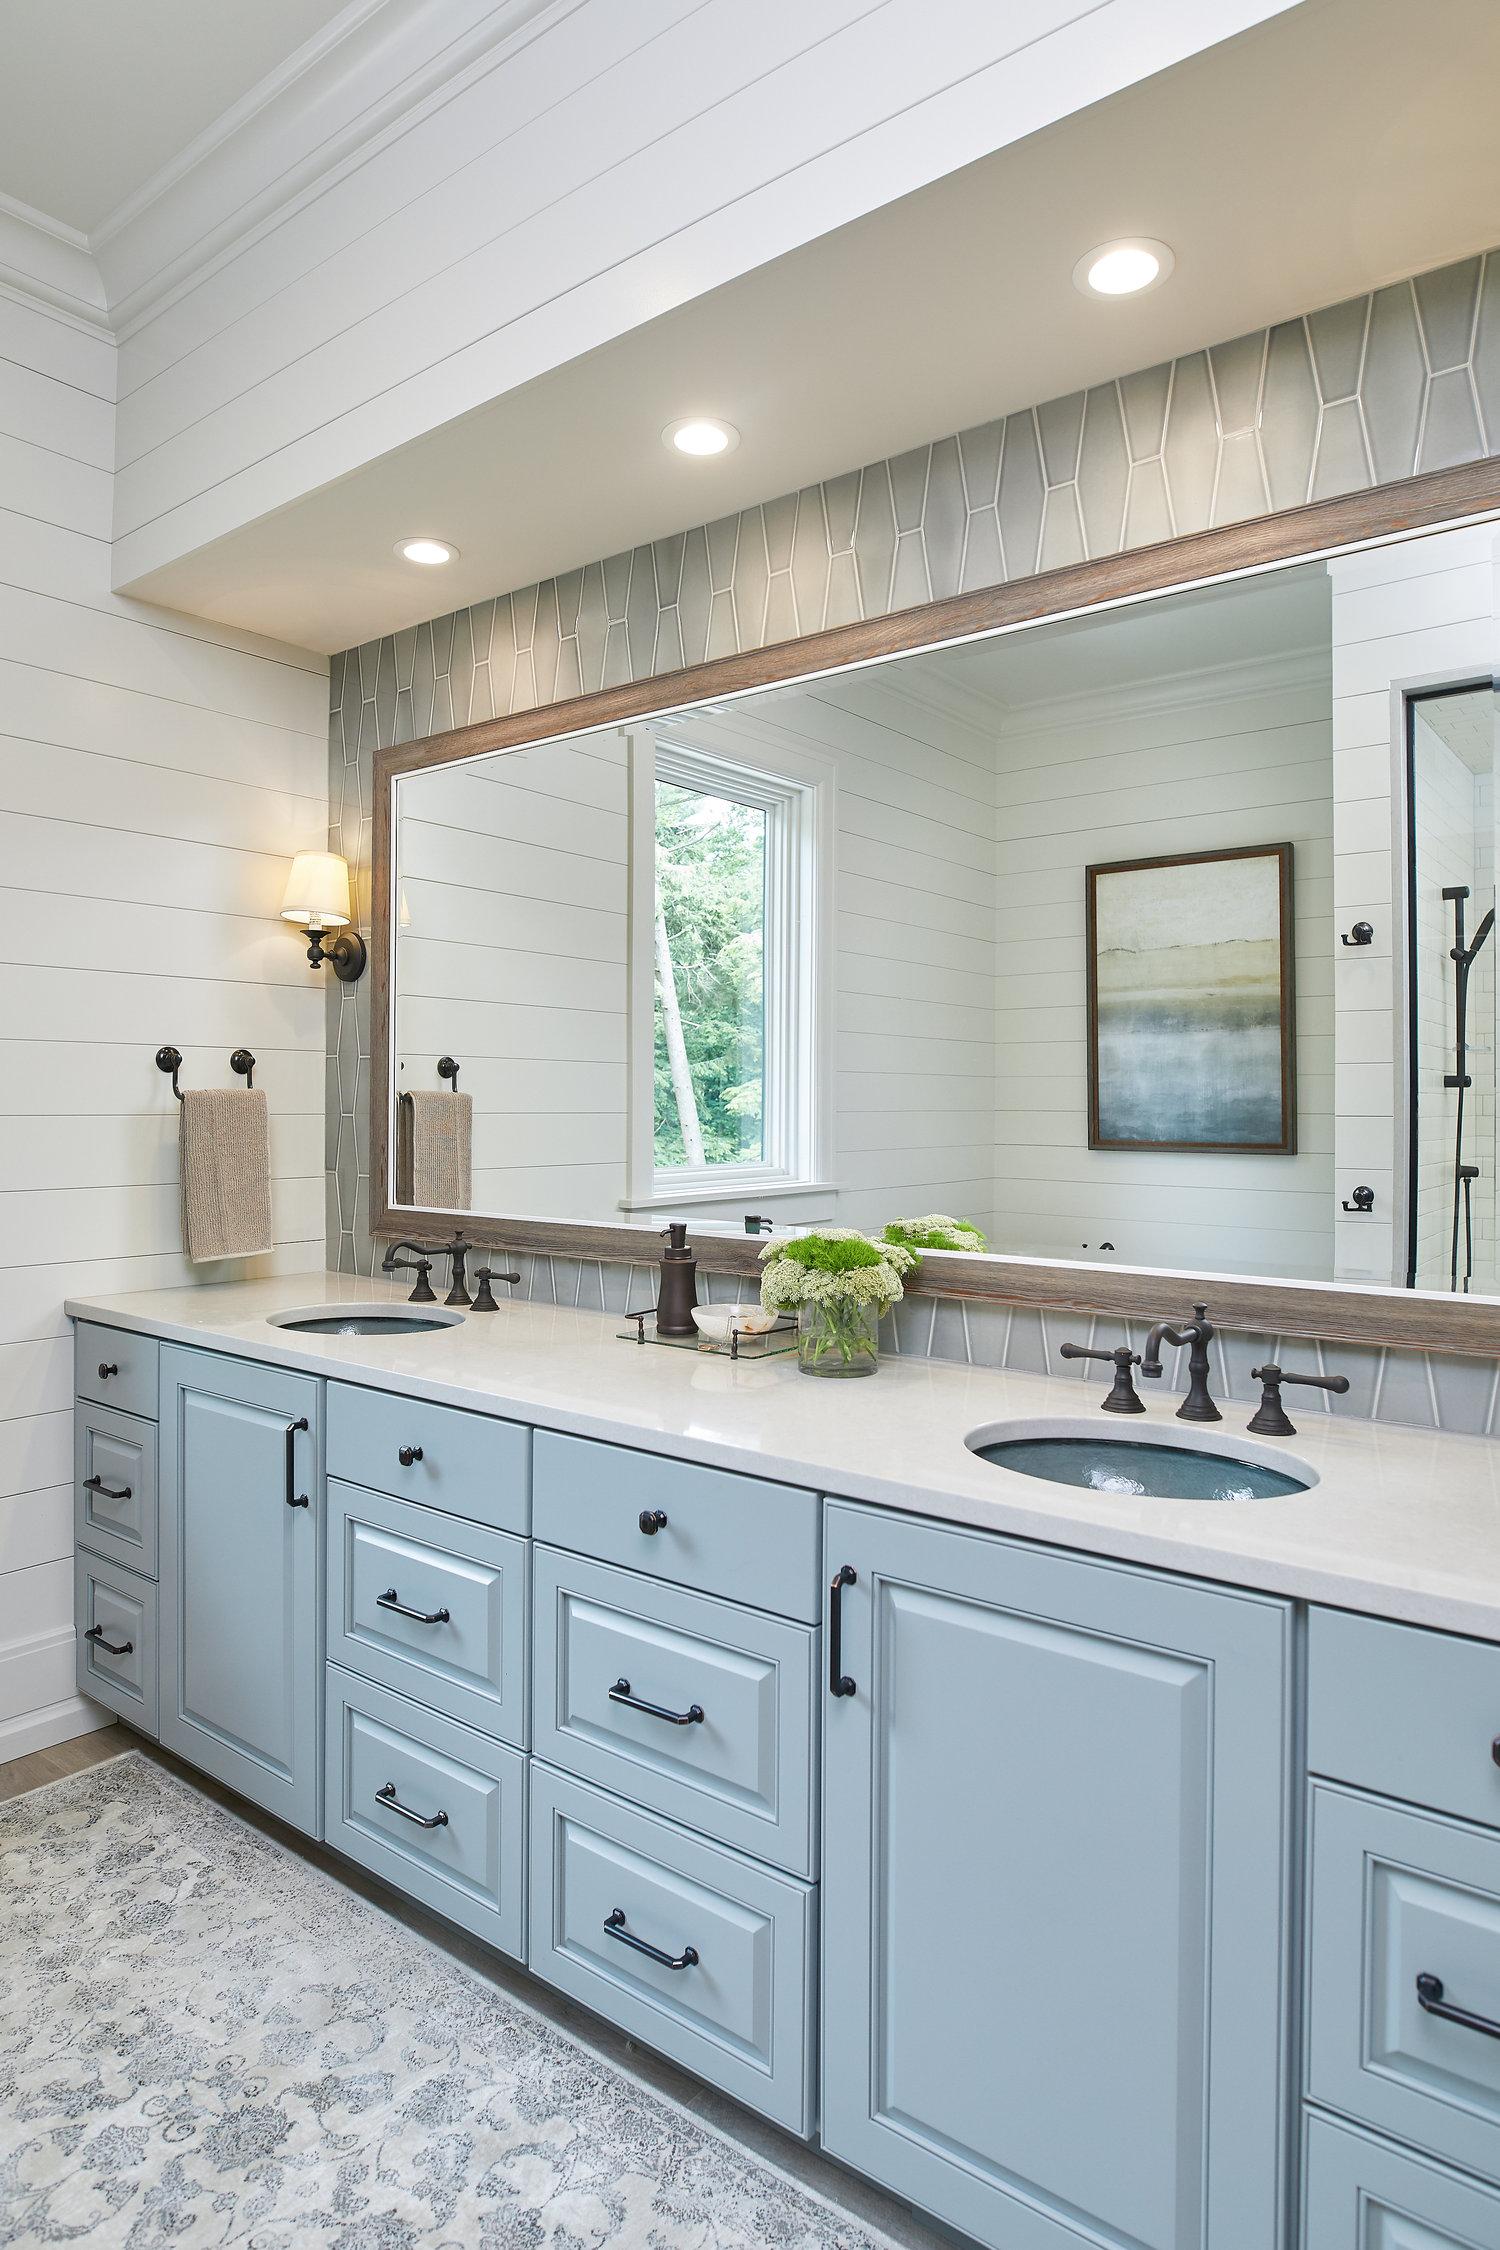 Lake House Master Suite Grand, Lake House Bathroom Images